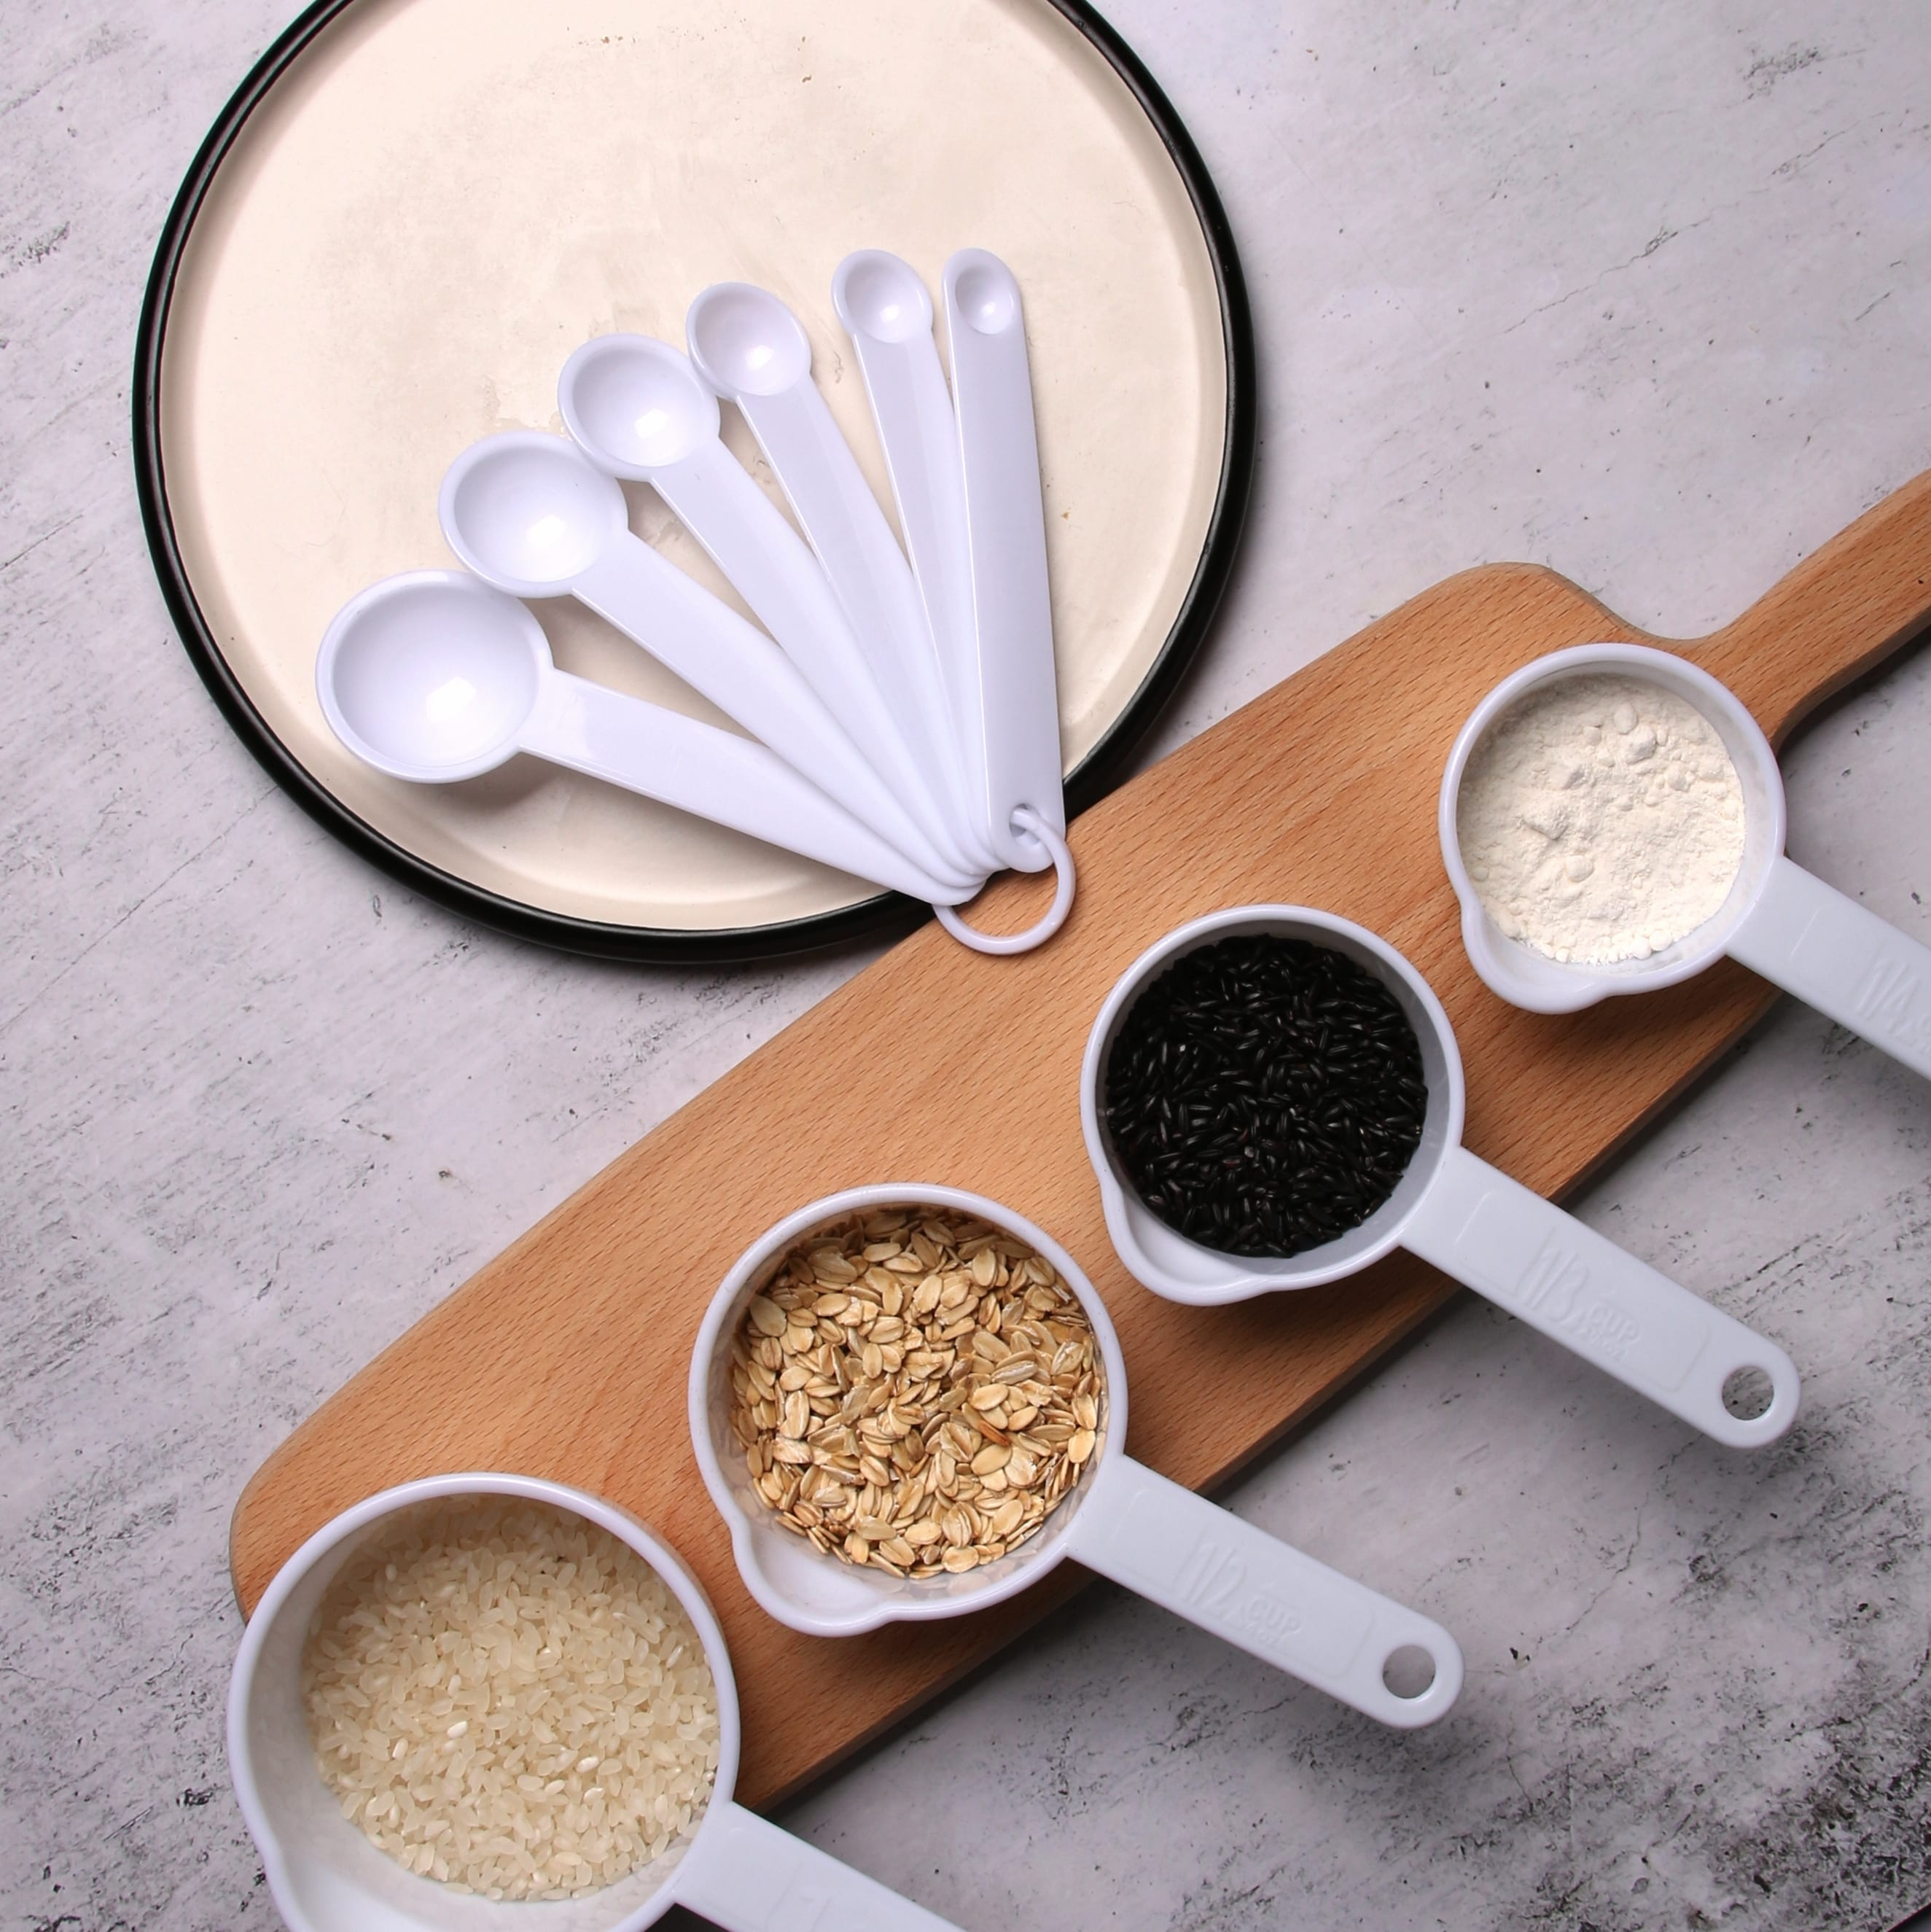 SHEIN coupon: Measuring Spoon Set 10pcs